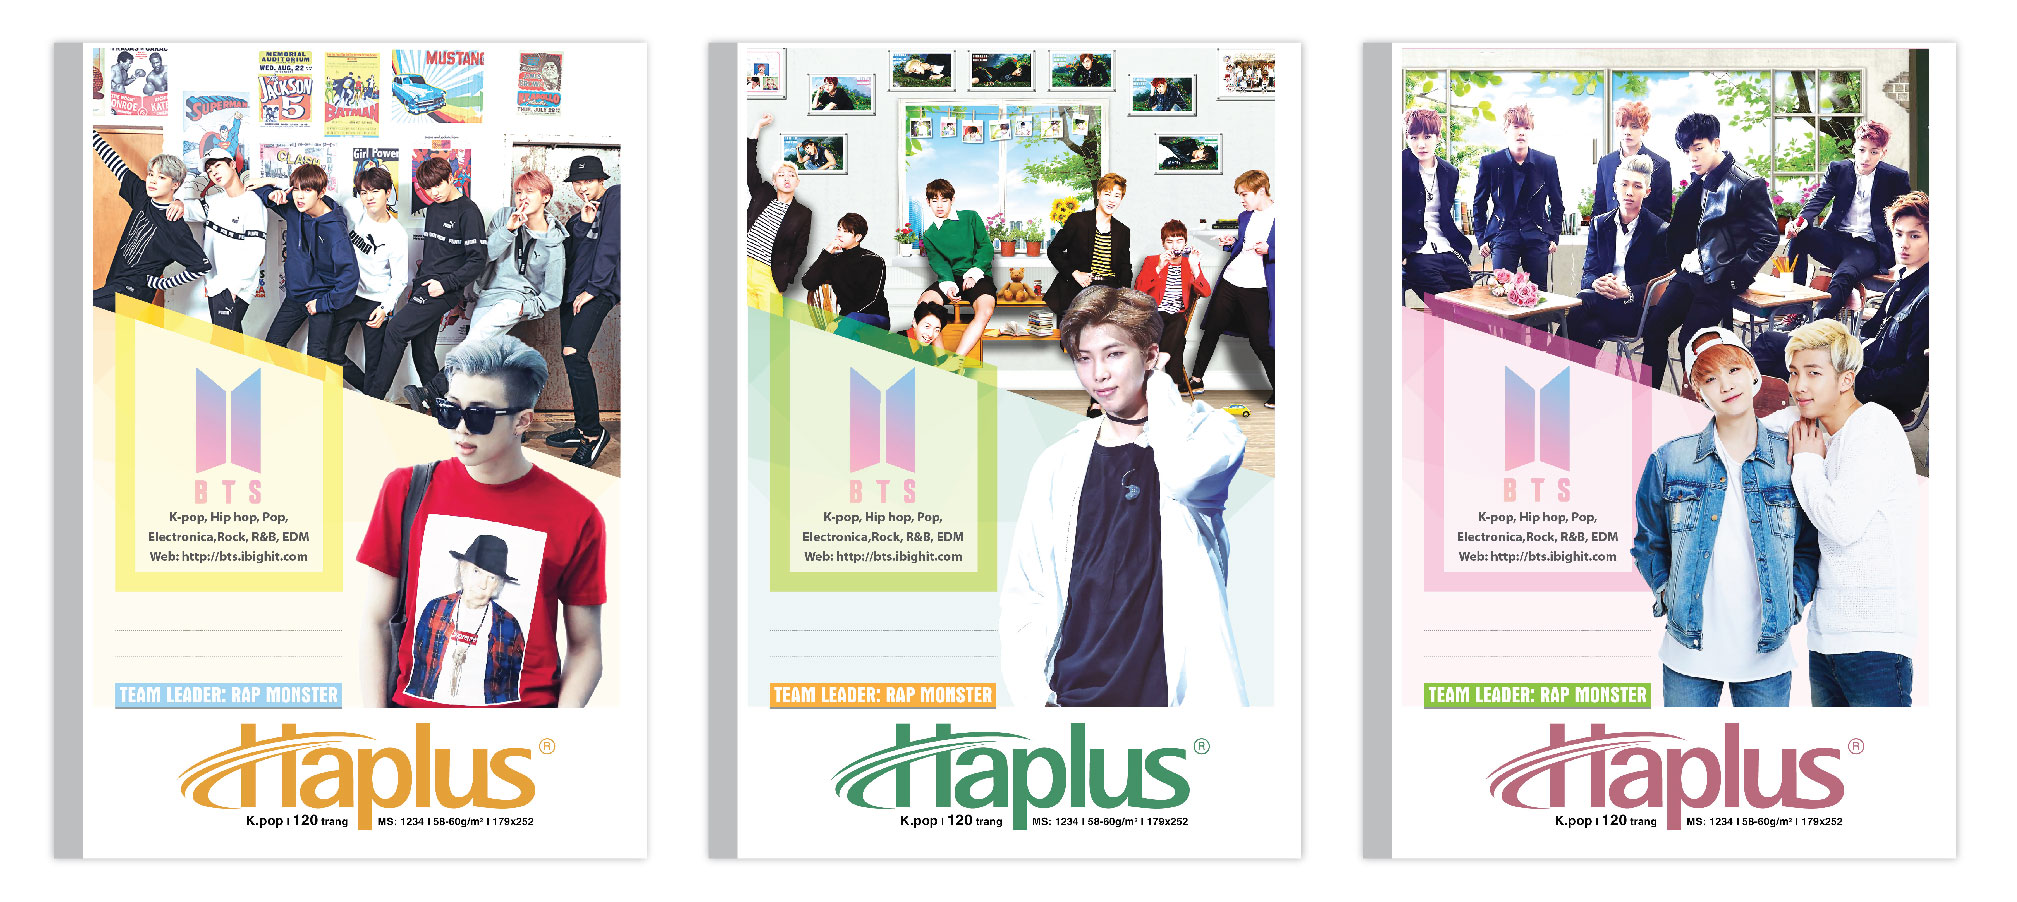 Haplus - K.Pop